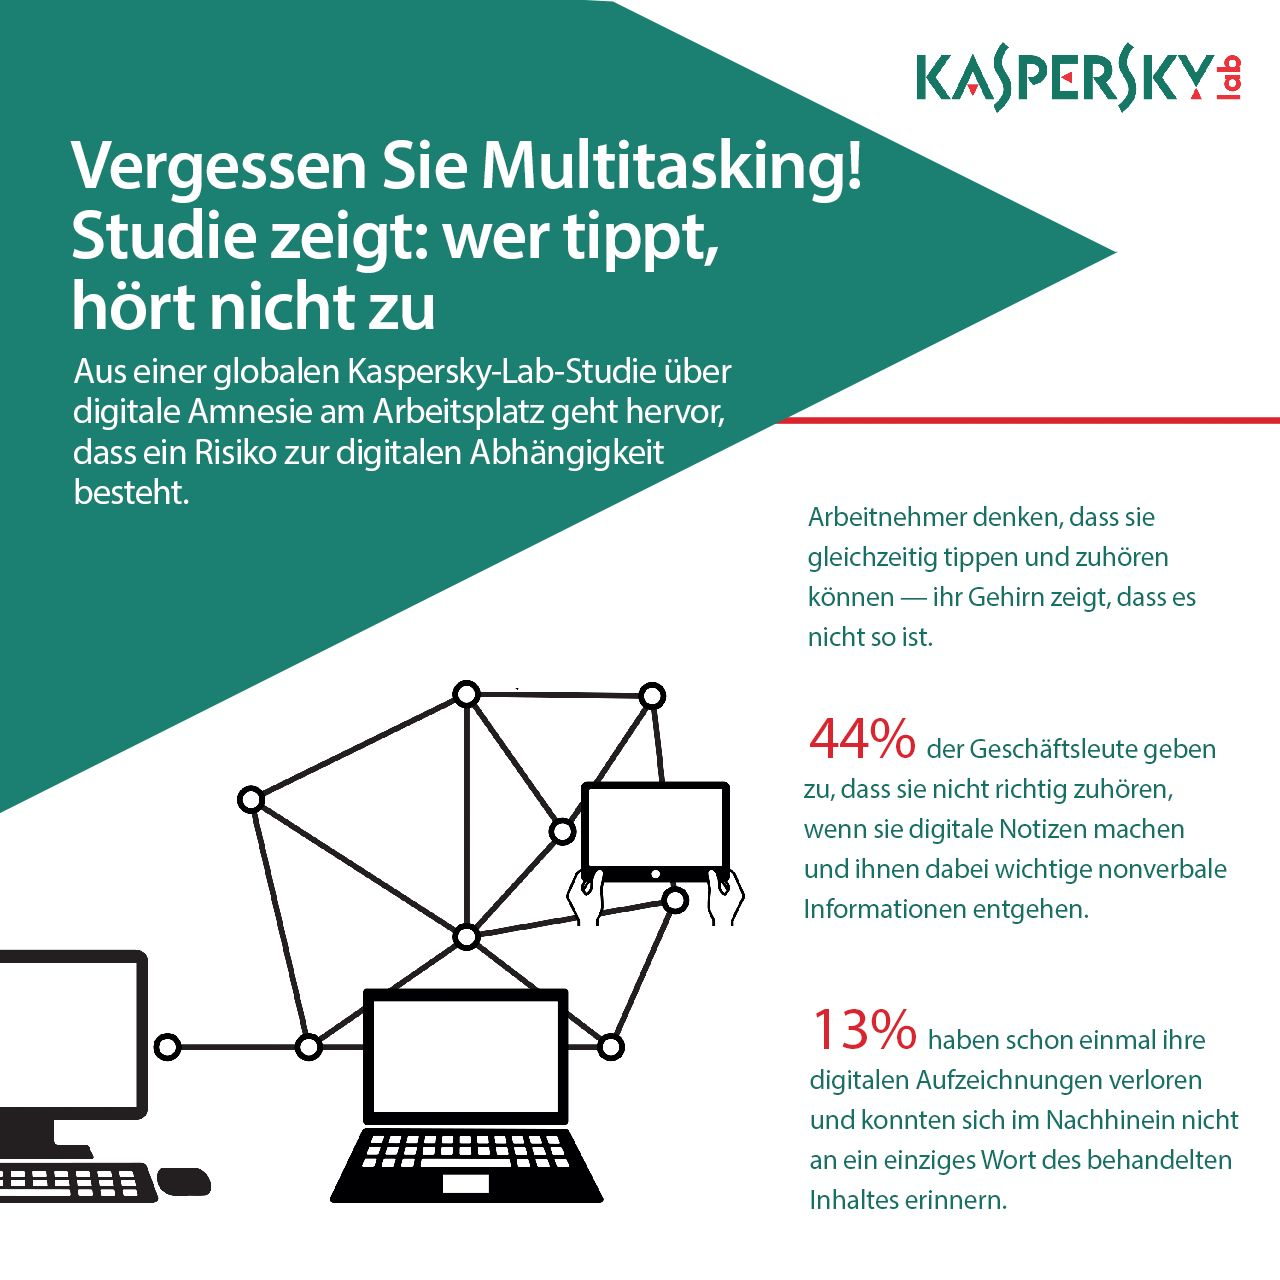 KASPERSKY lab, Digitale Amnesie, Multitasking